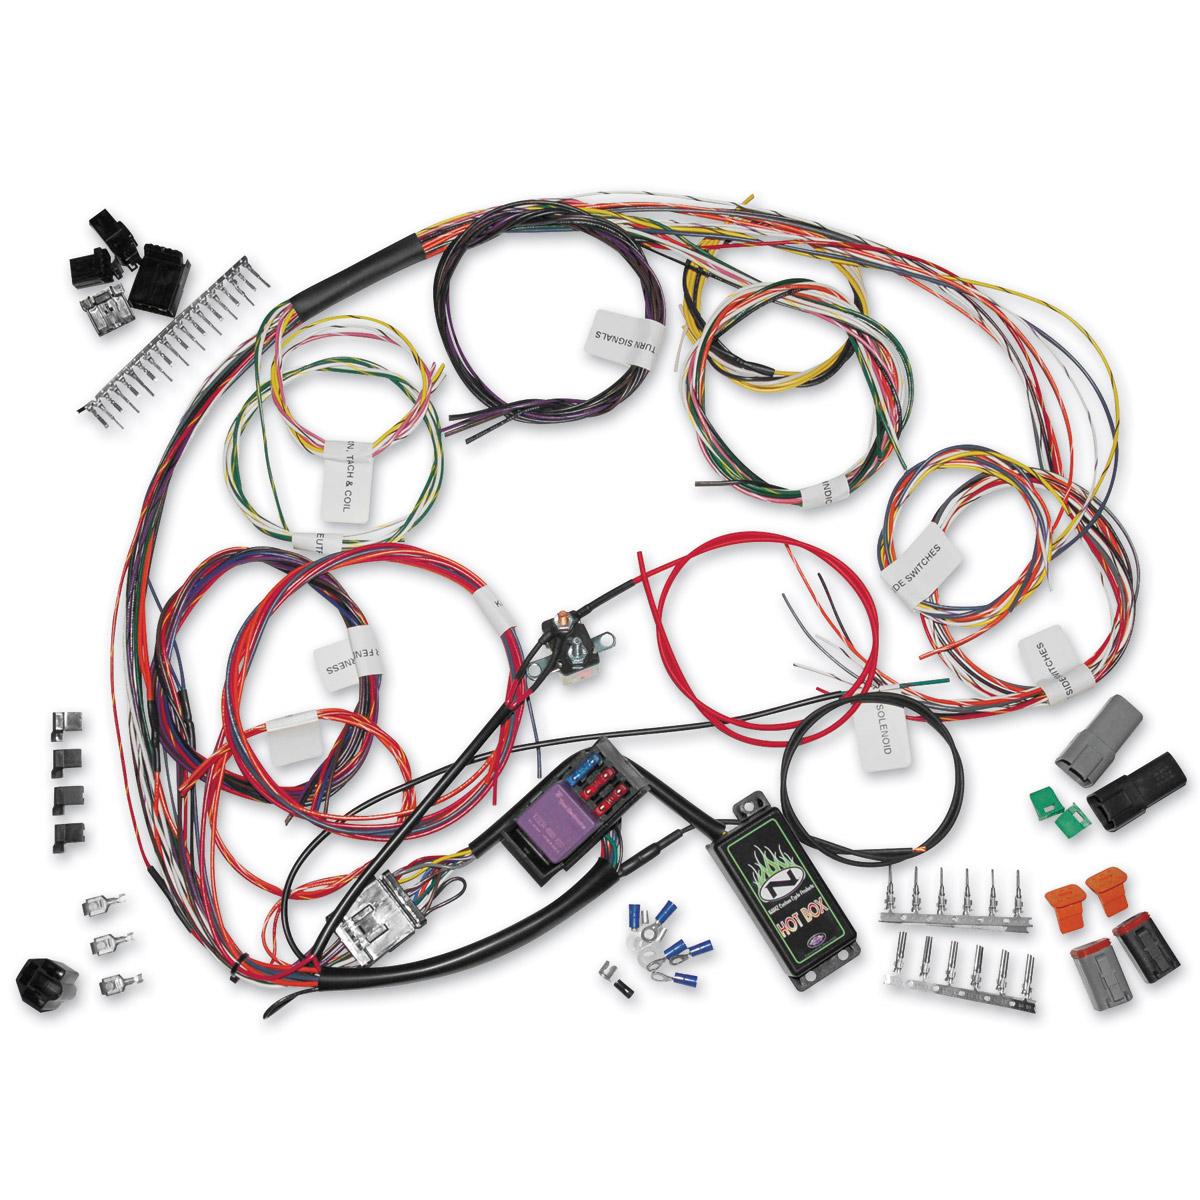 rz_9167] custom wiring harness kits download diagram  eumqu embo vish ungo sapebe mohammedshrine librar wiring 101